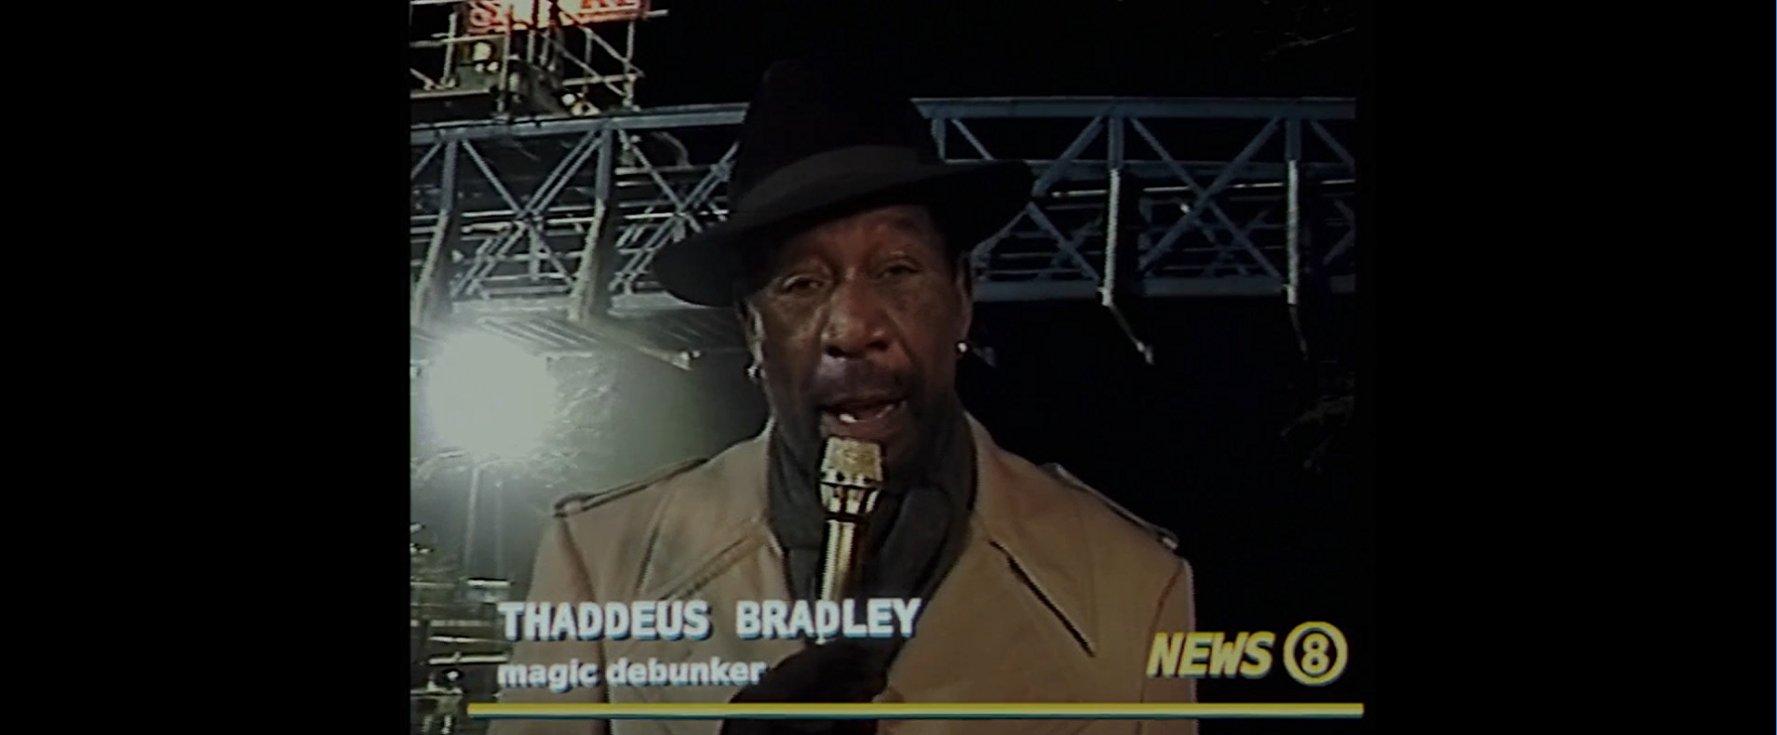 Thaddeus Bradley